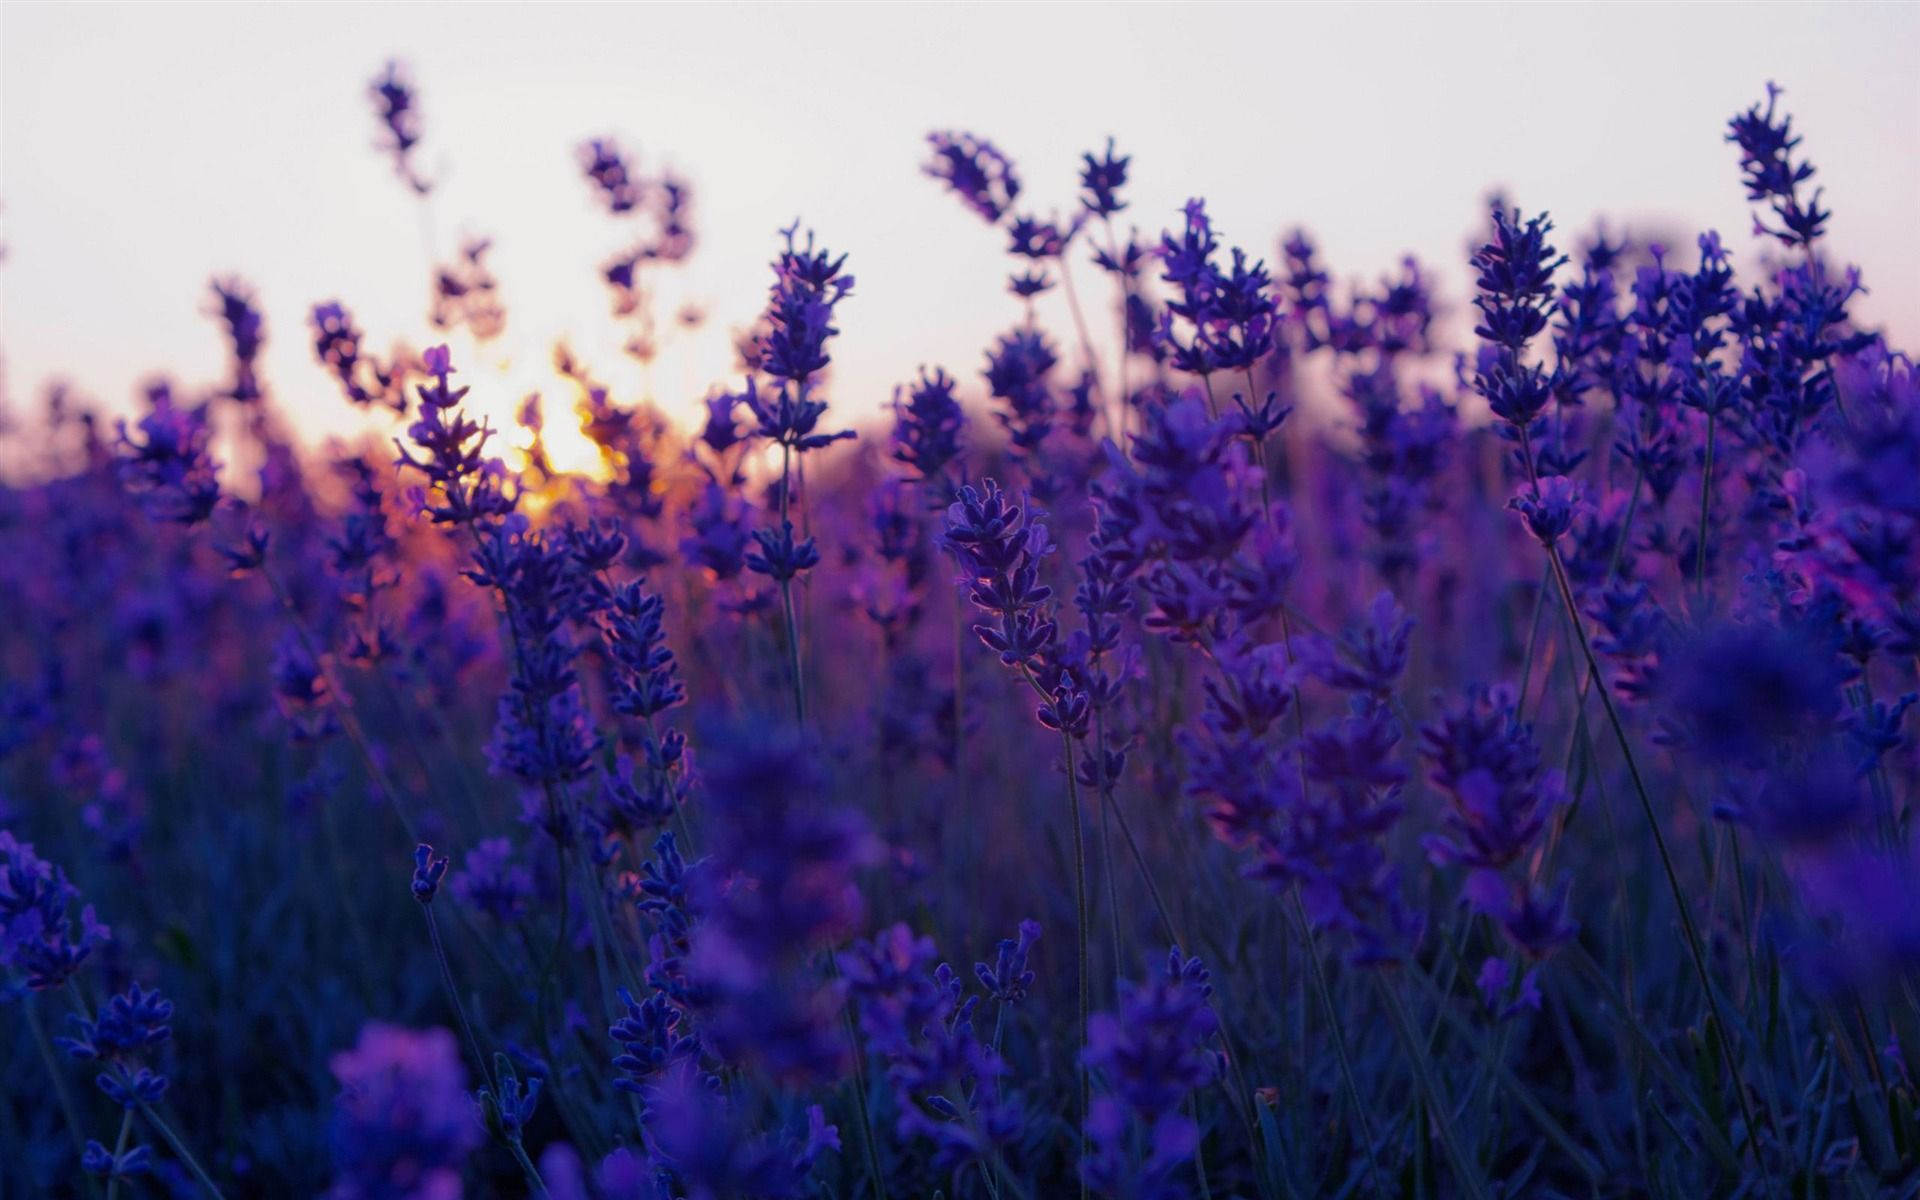 Lavender Fields LAVENDER LOVE ✿⊱╠Pinterest